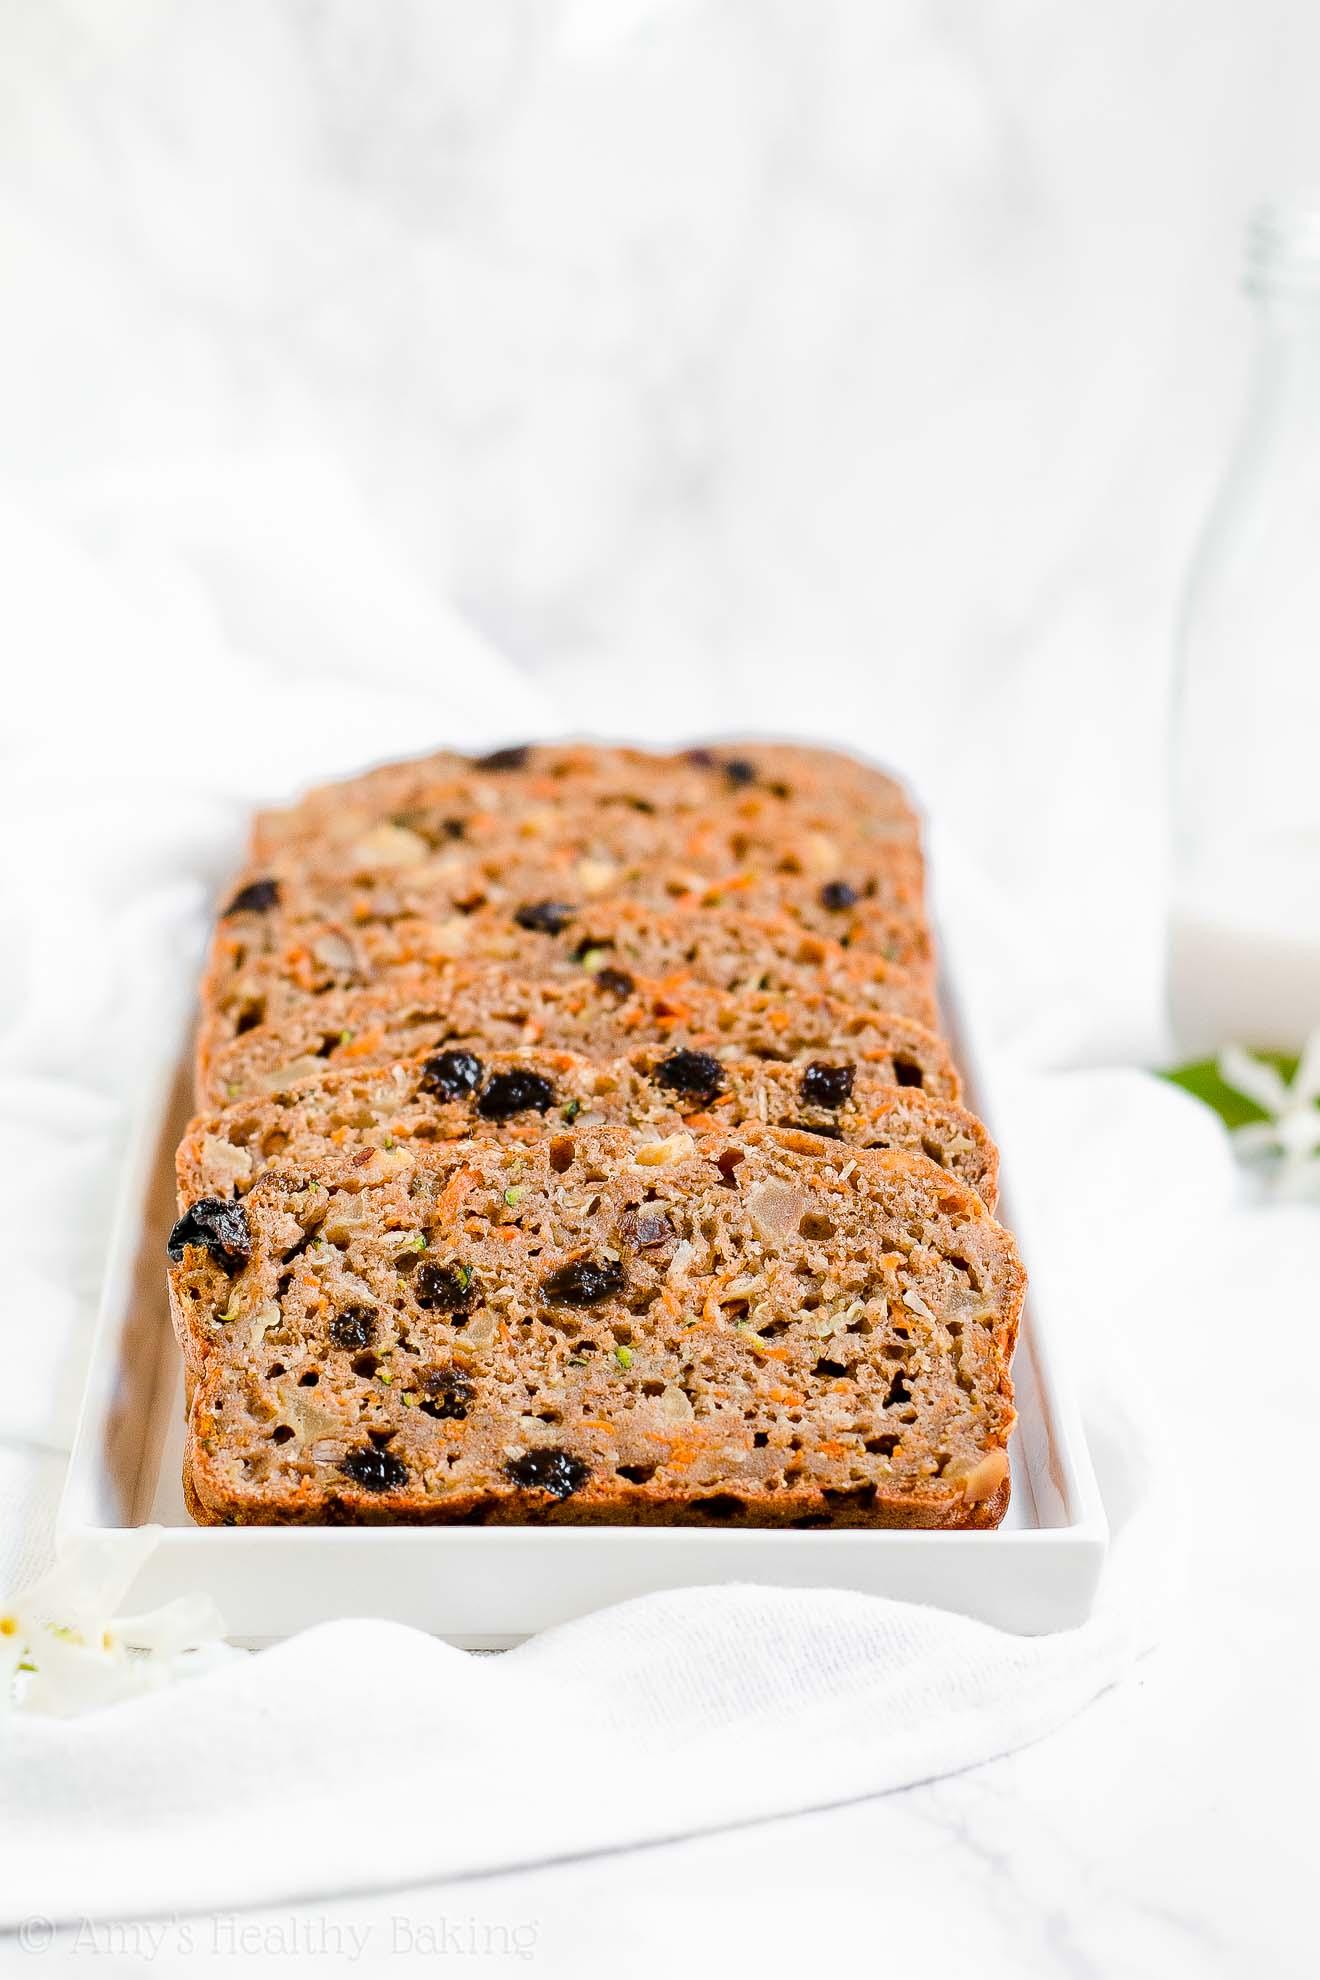 Moist Healthy Morning Glory Zucchini Bread with no sugar